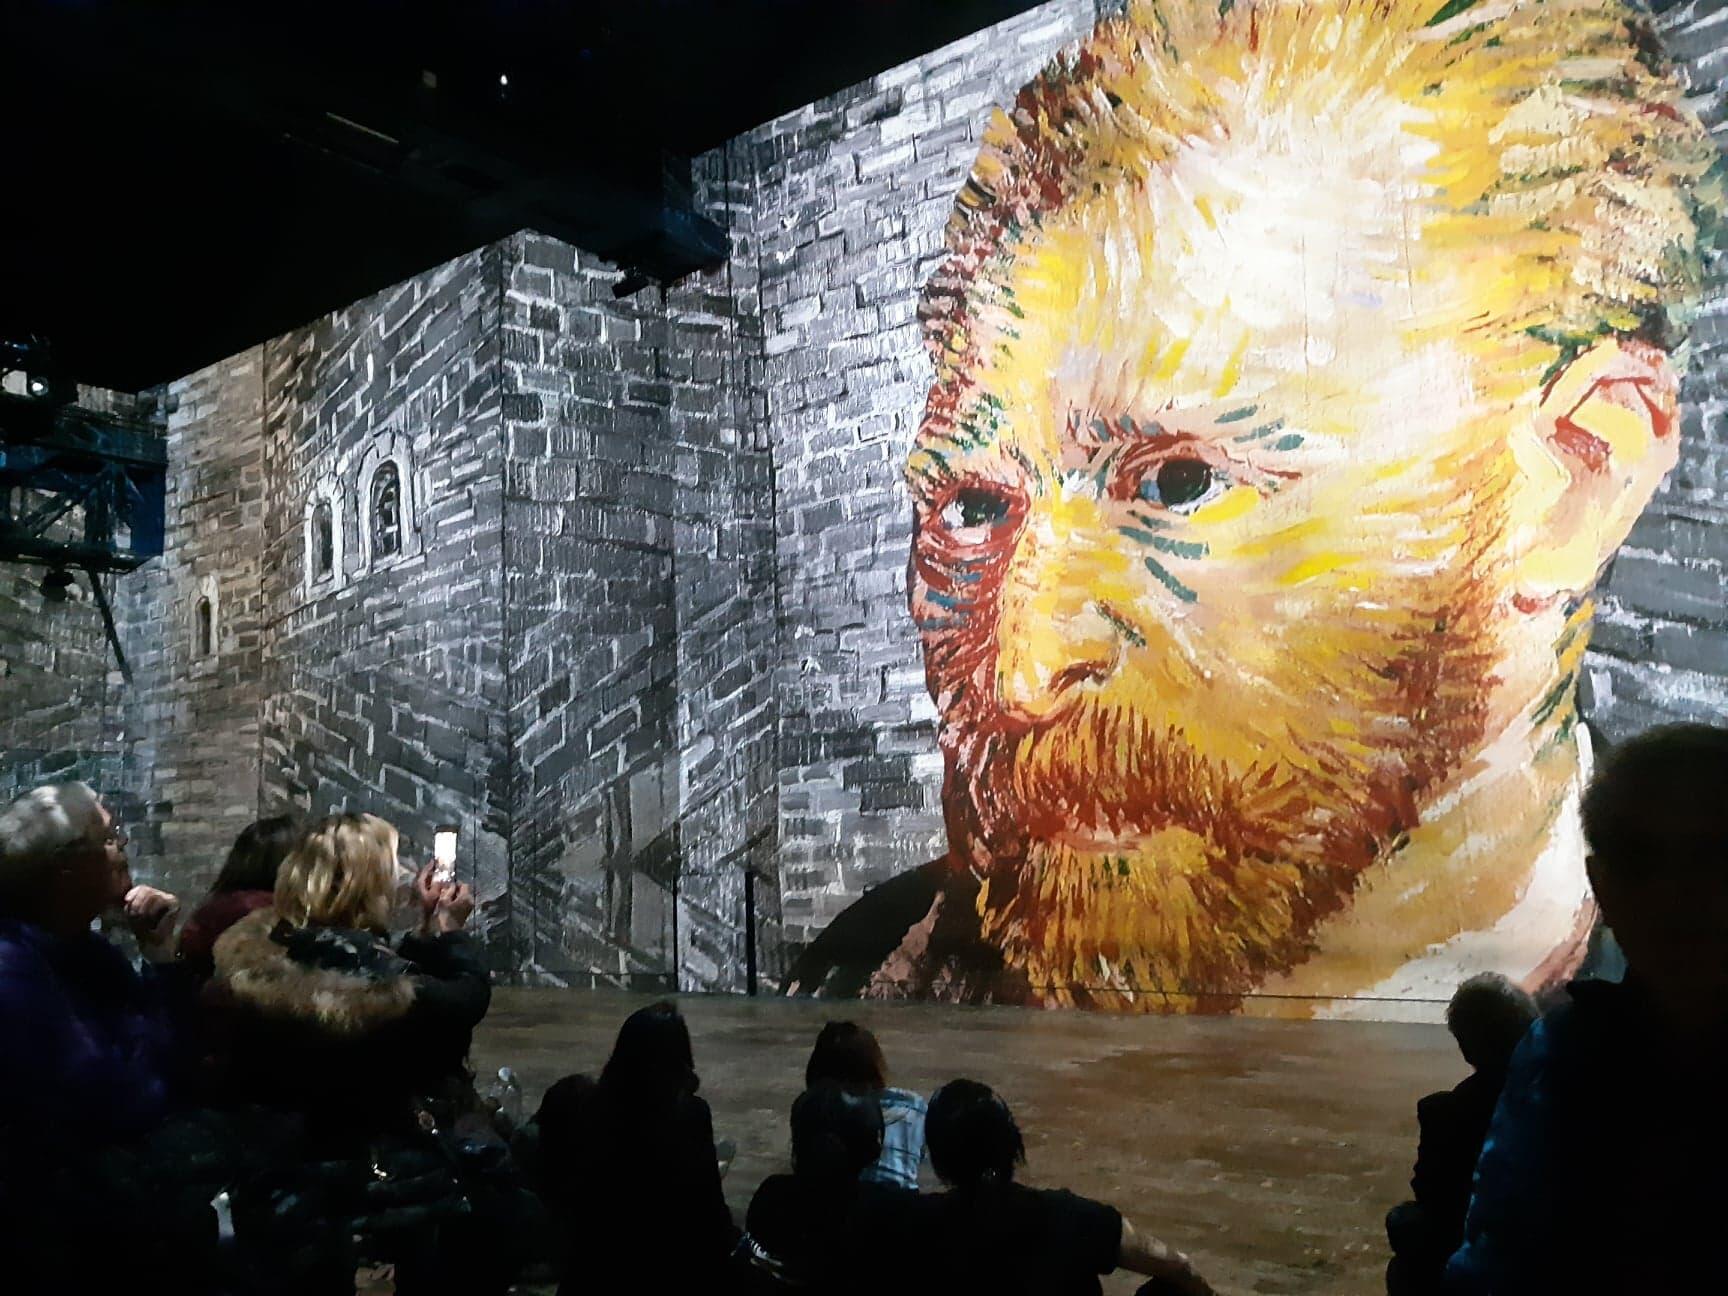 A exposição Van Gogh, la nuit etoilée, fica em cartaz no Atelier des Lumières, em Paris, até 31 de dezembro.